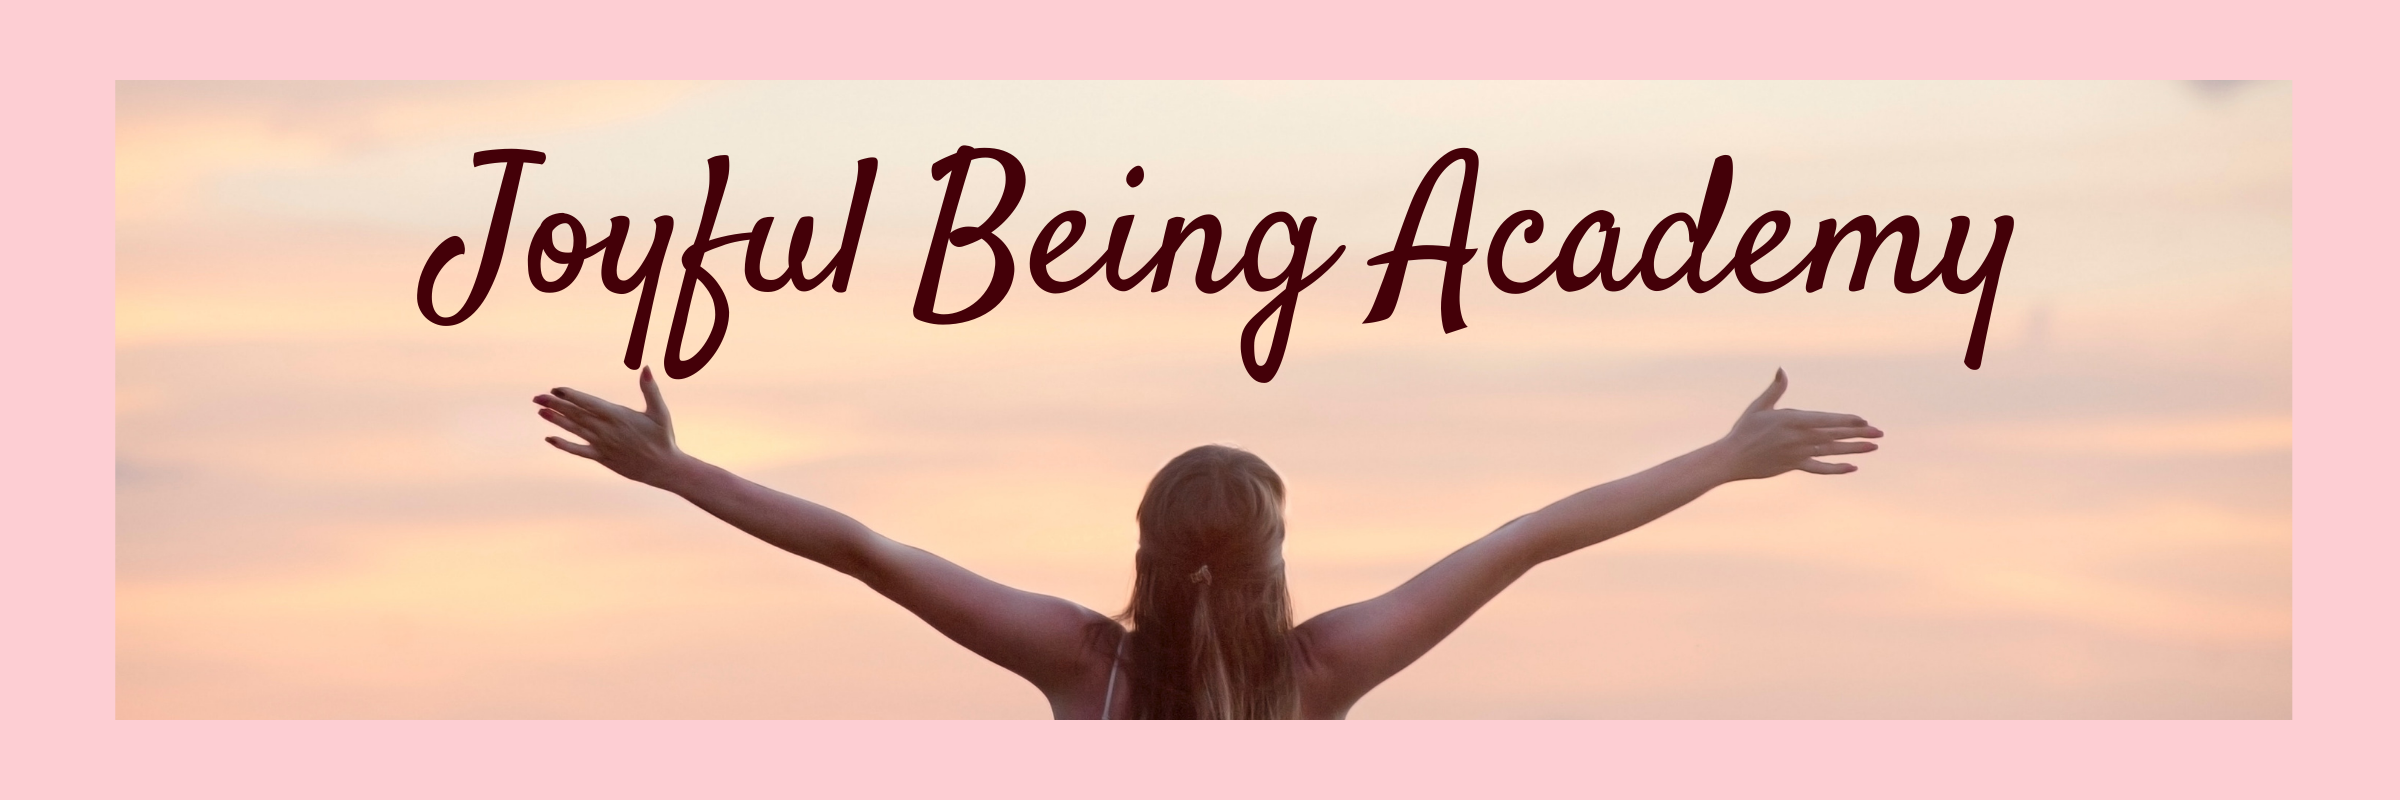 Joyful Being Academy Banner